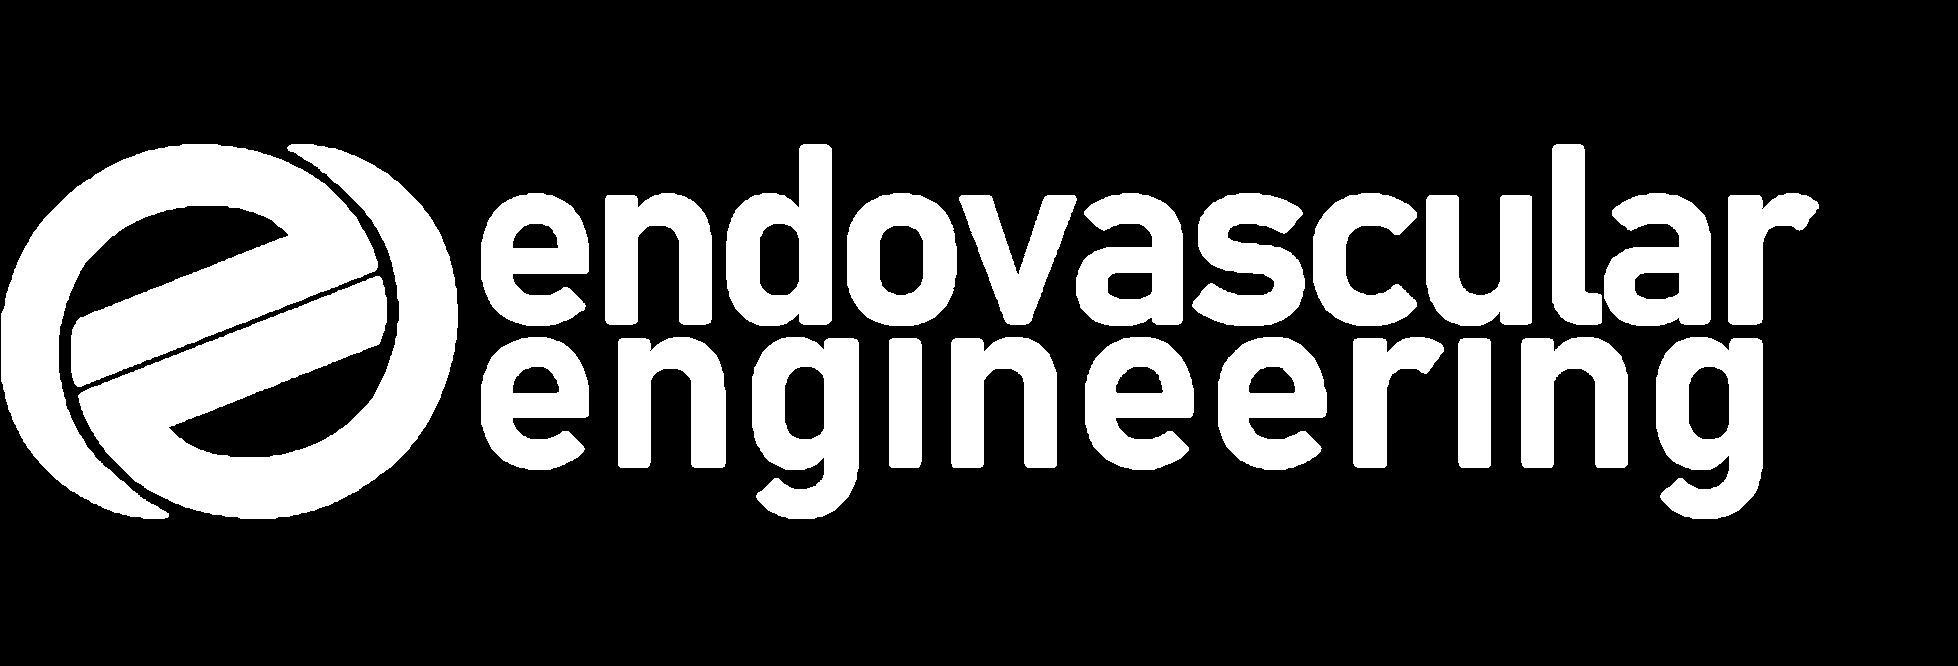 Endovascular Engineering